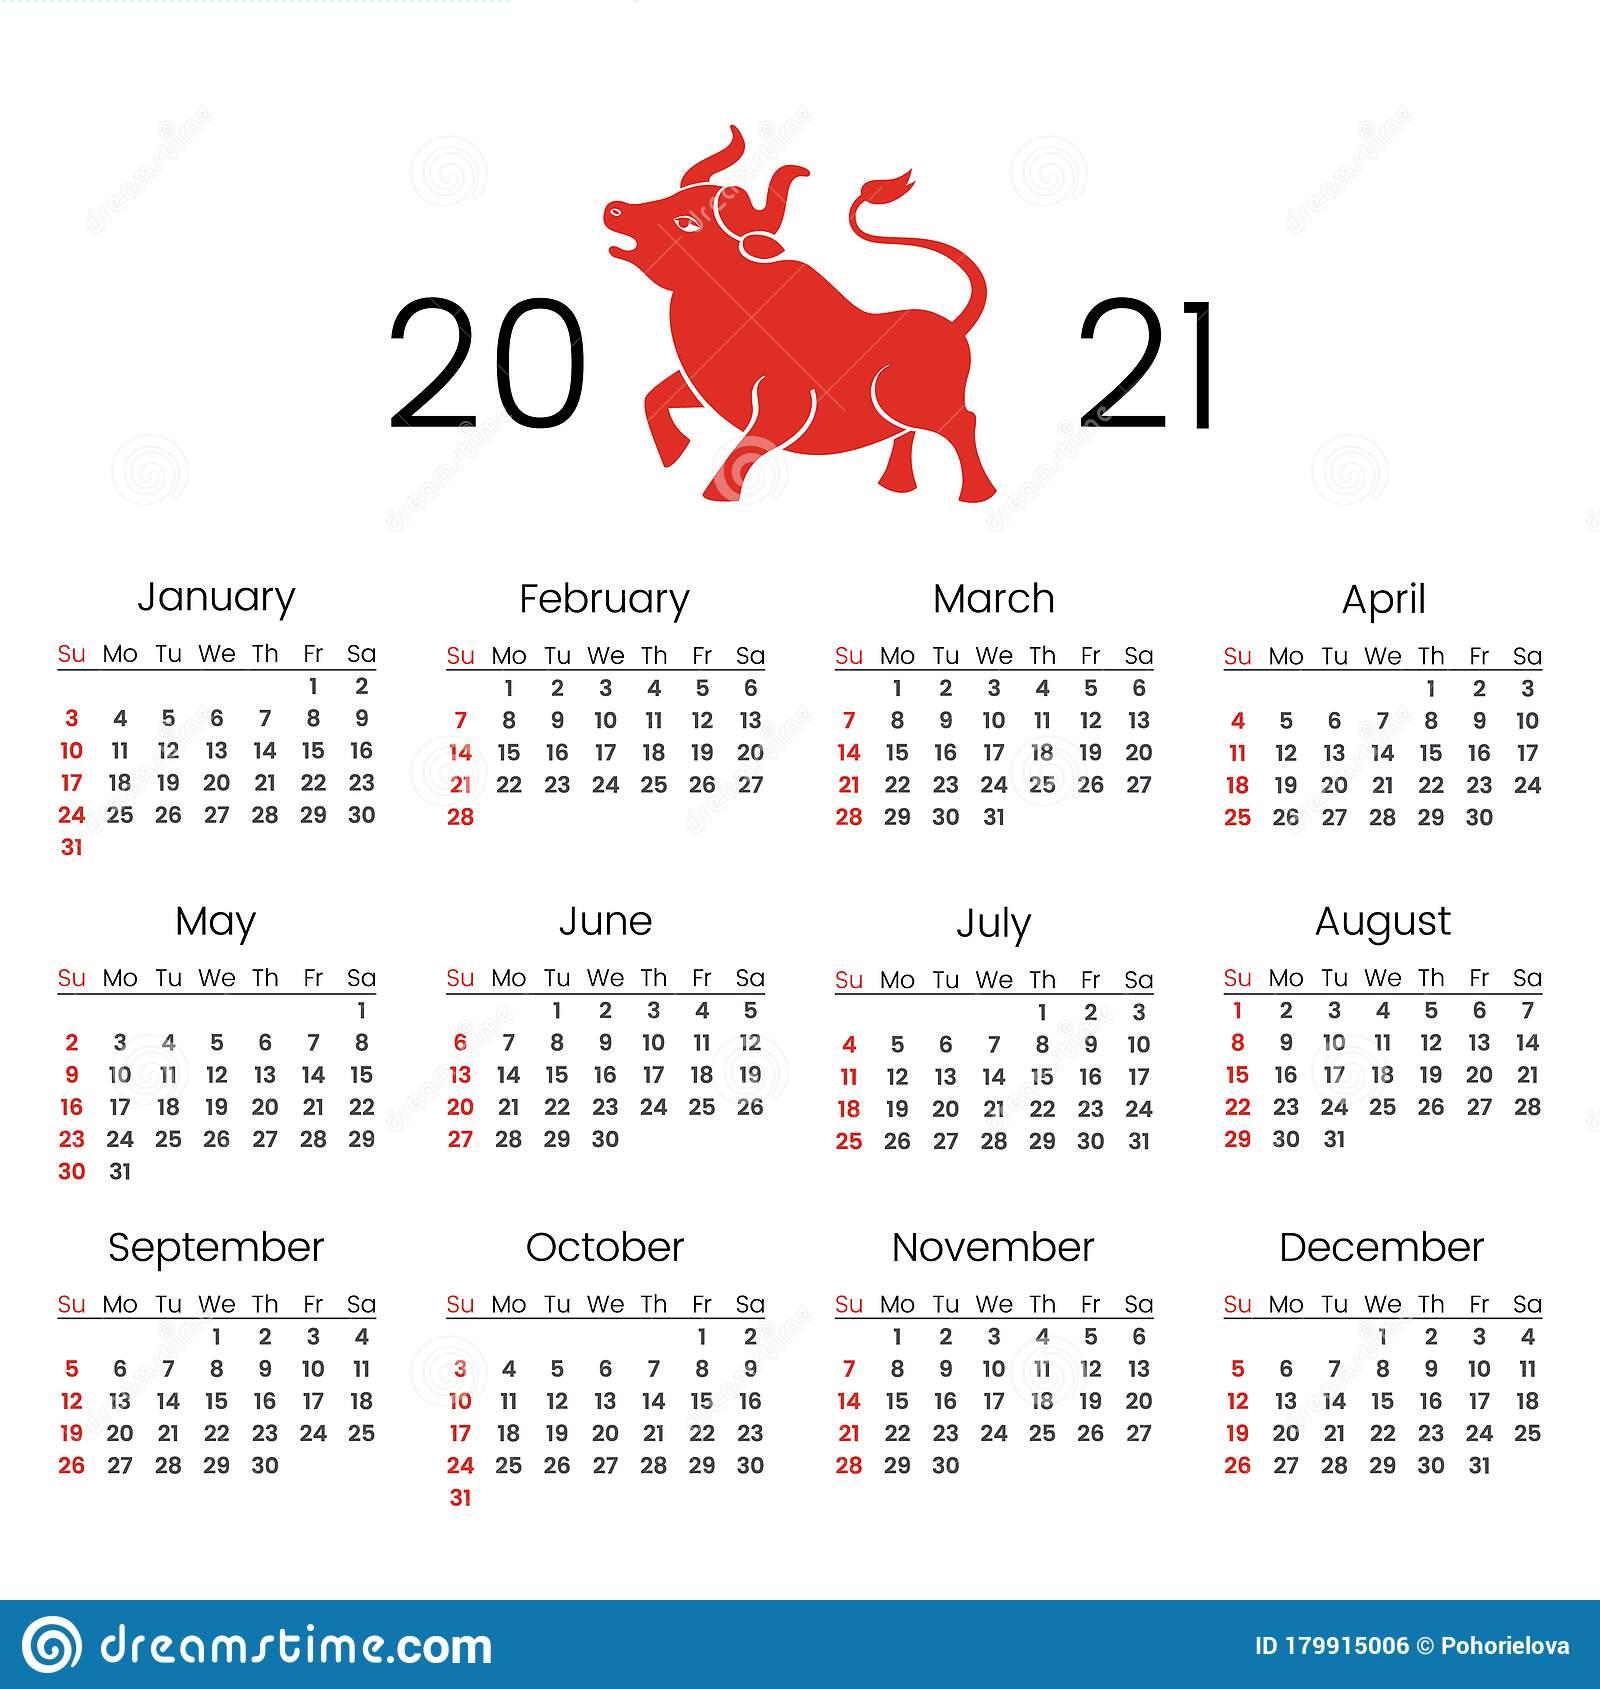 Lunar Calendar 2021 Free Printable : 2021 Lunar Calendar